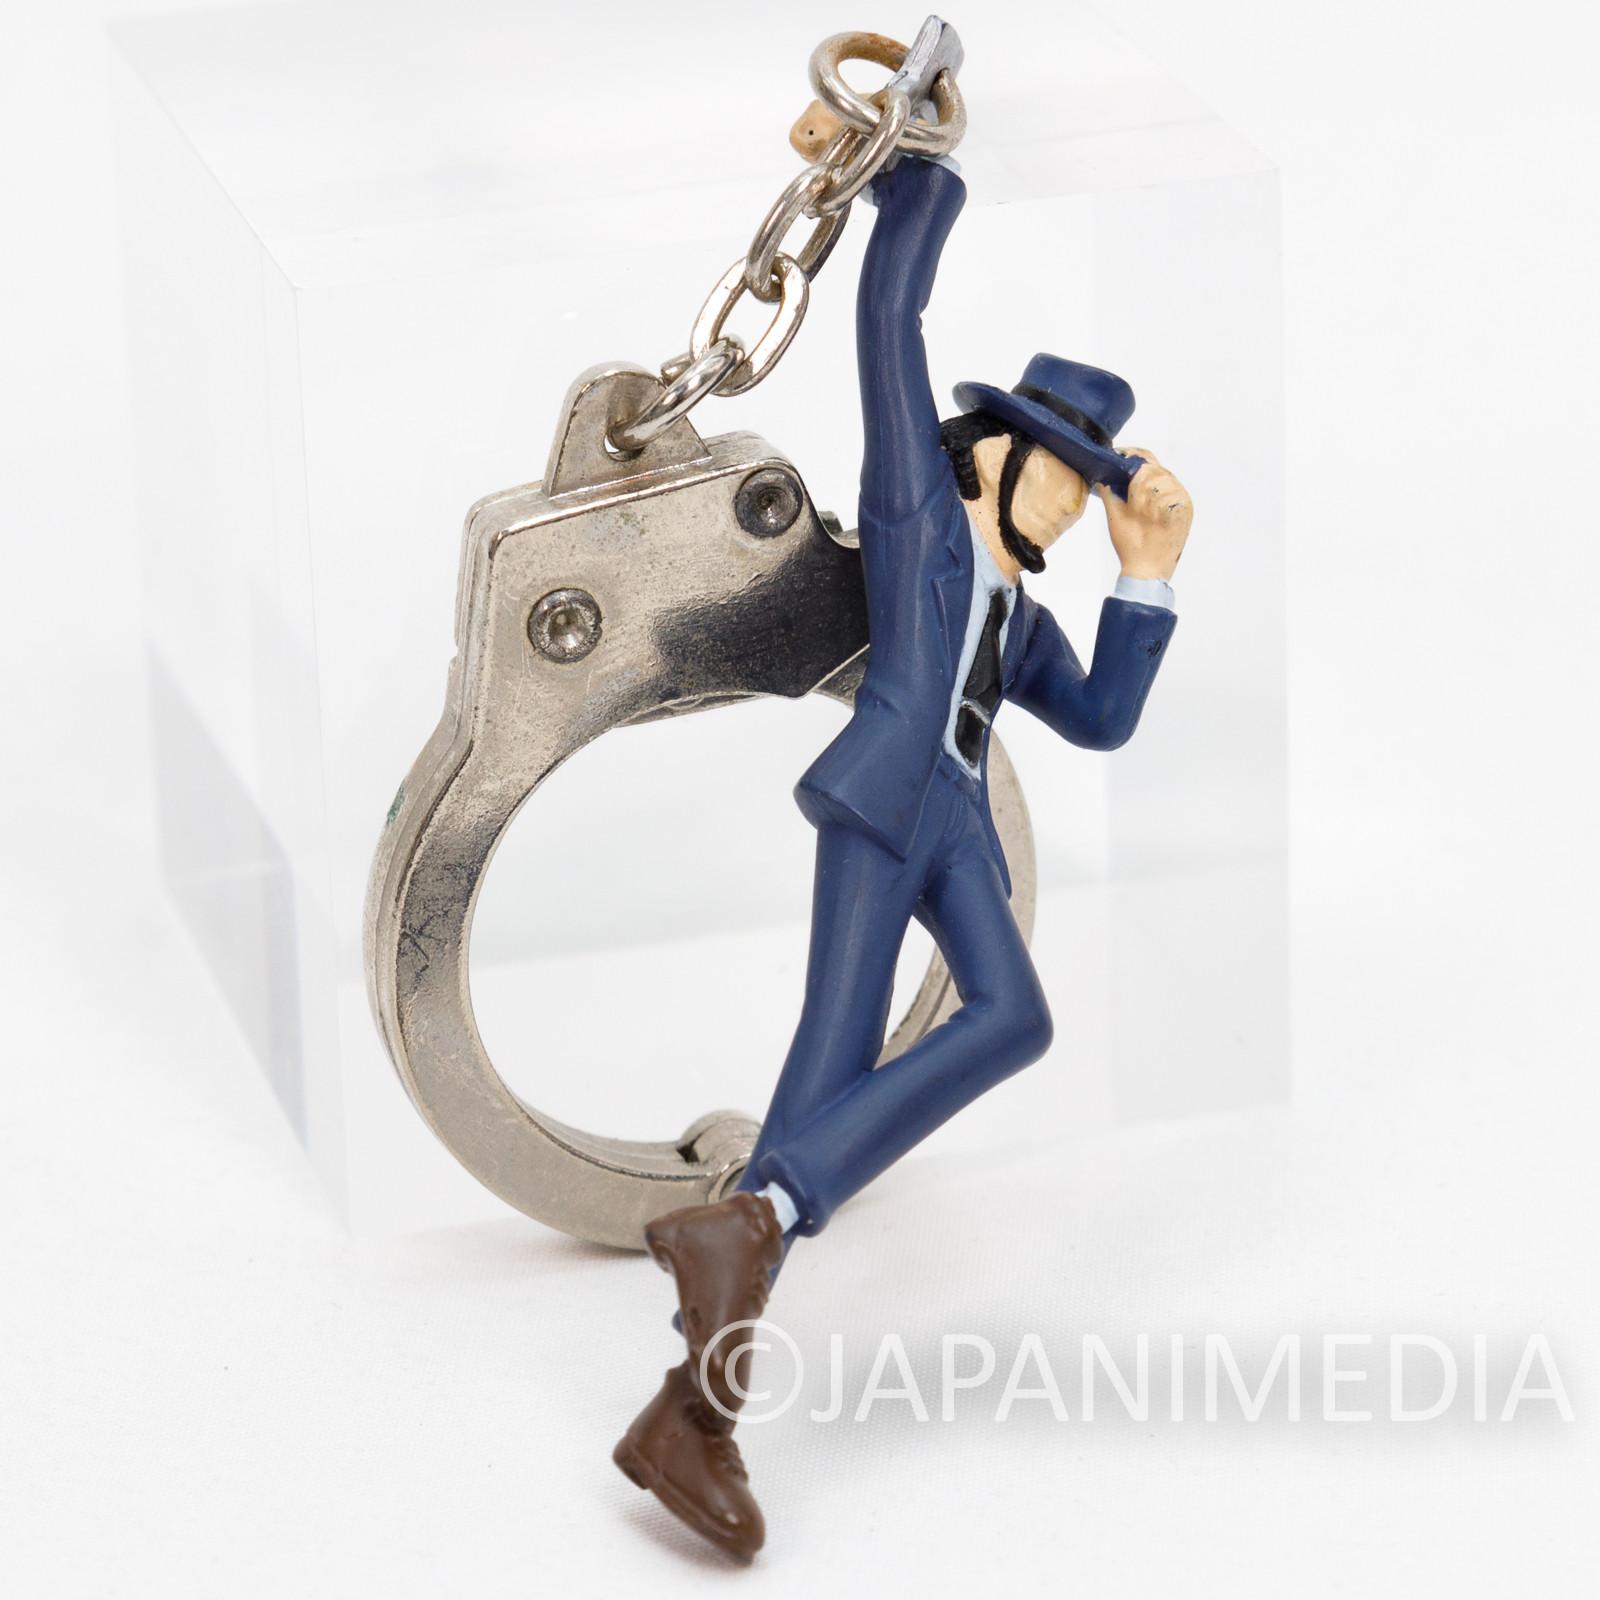 Lupin the Third (3rd) Jigen Handcuff & Figure Keychain Banpresto JAPAN ANIME